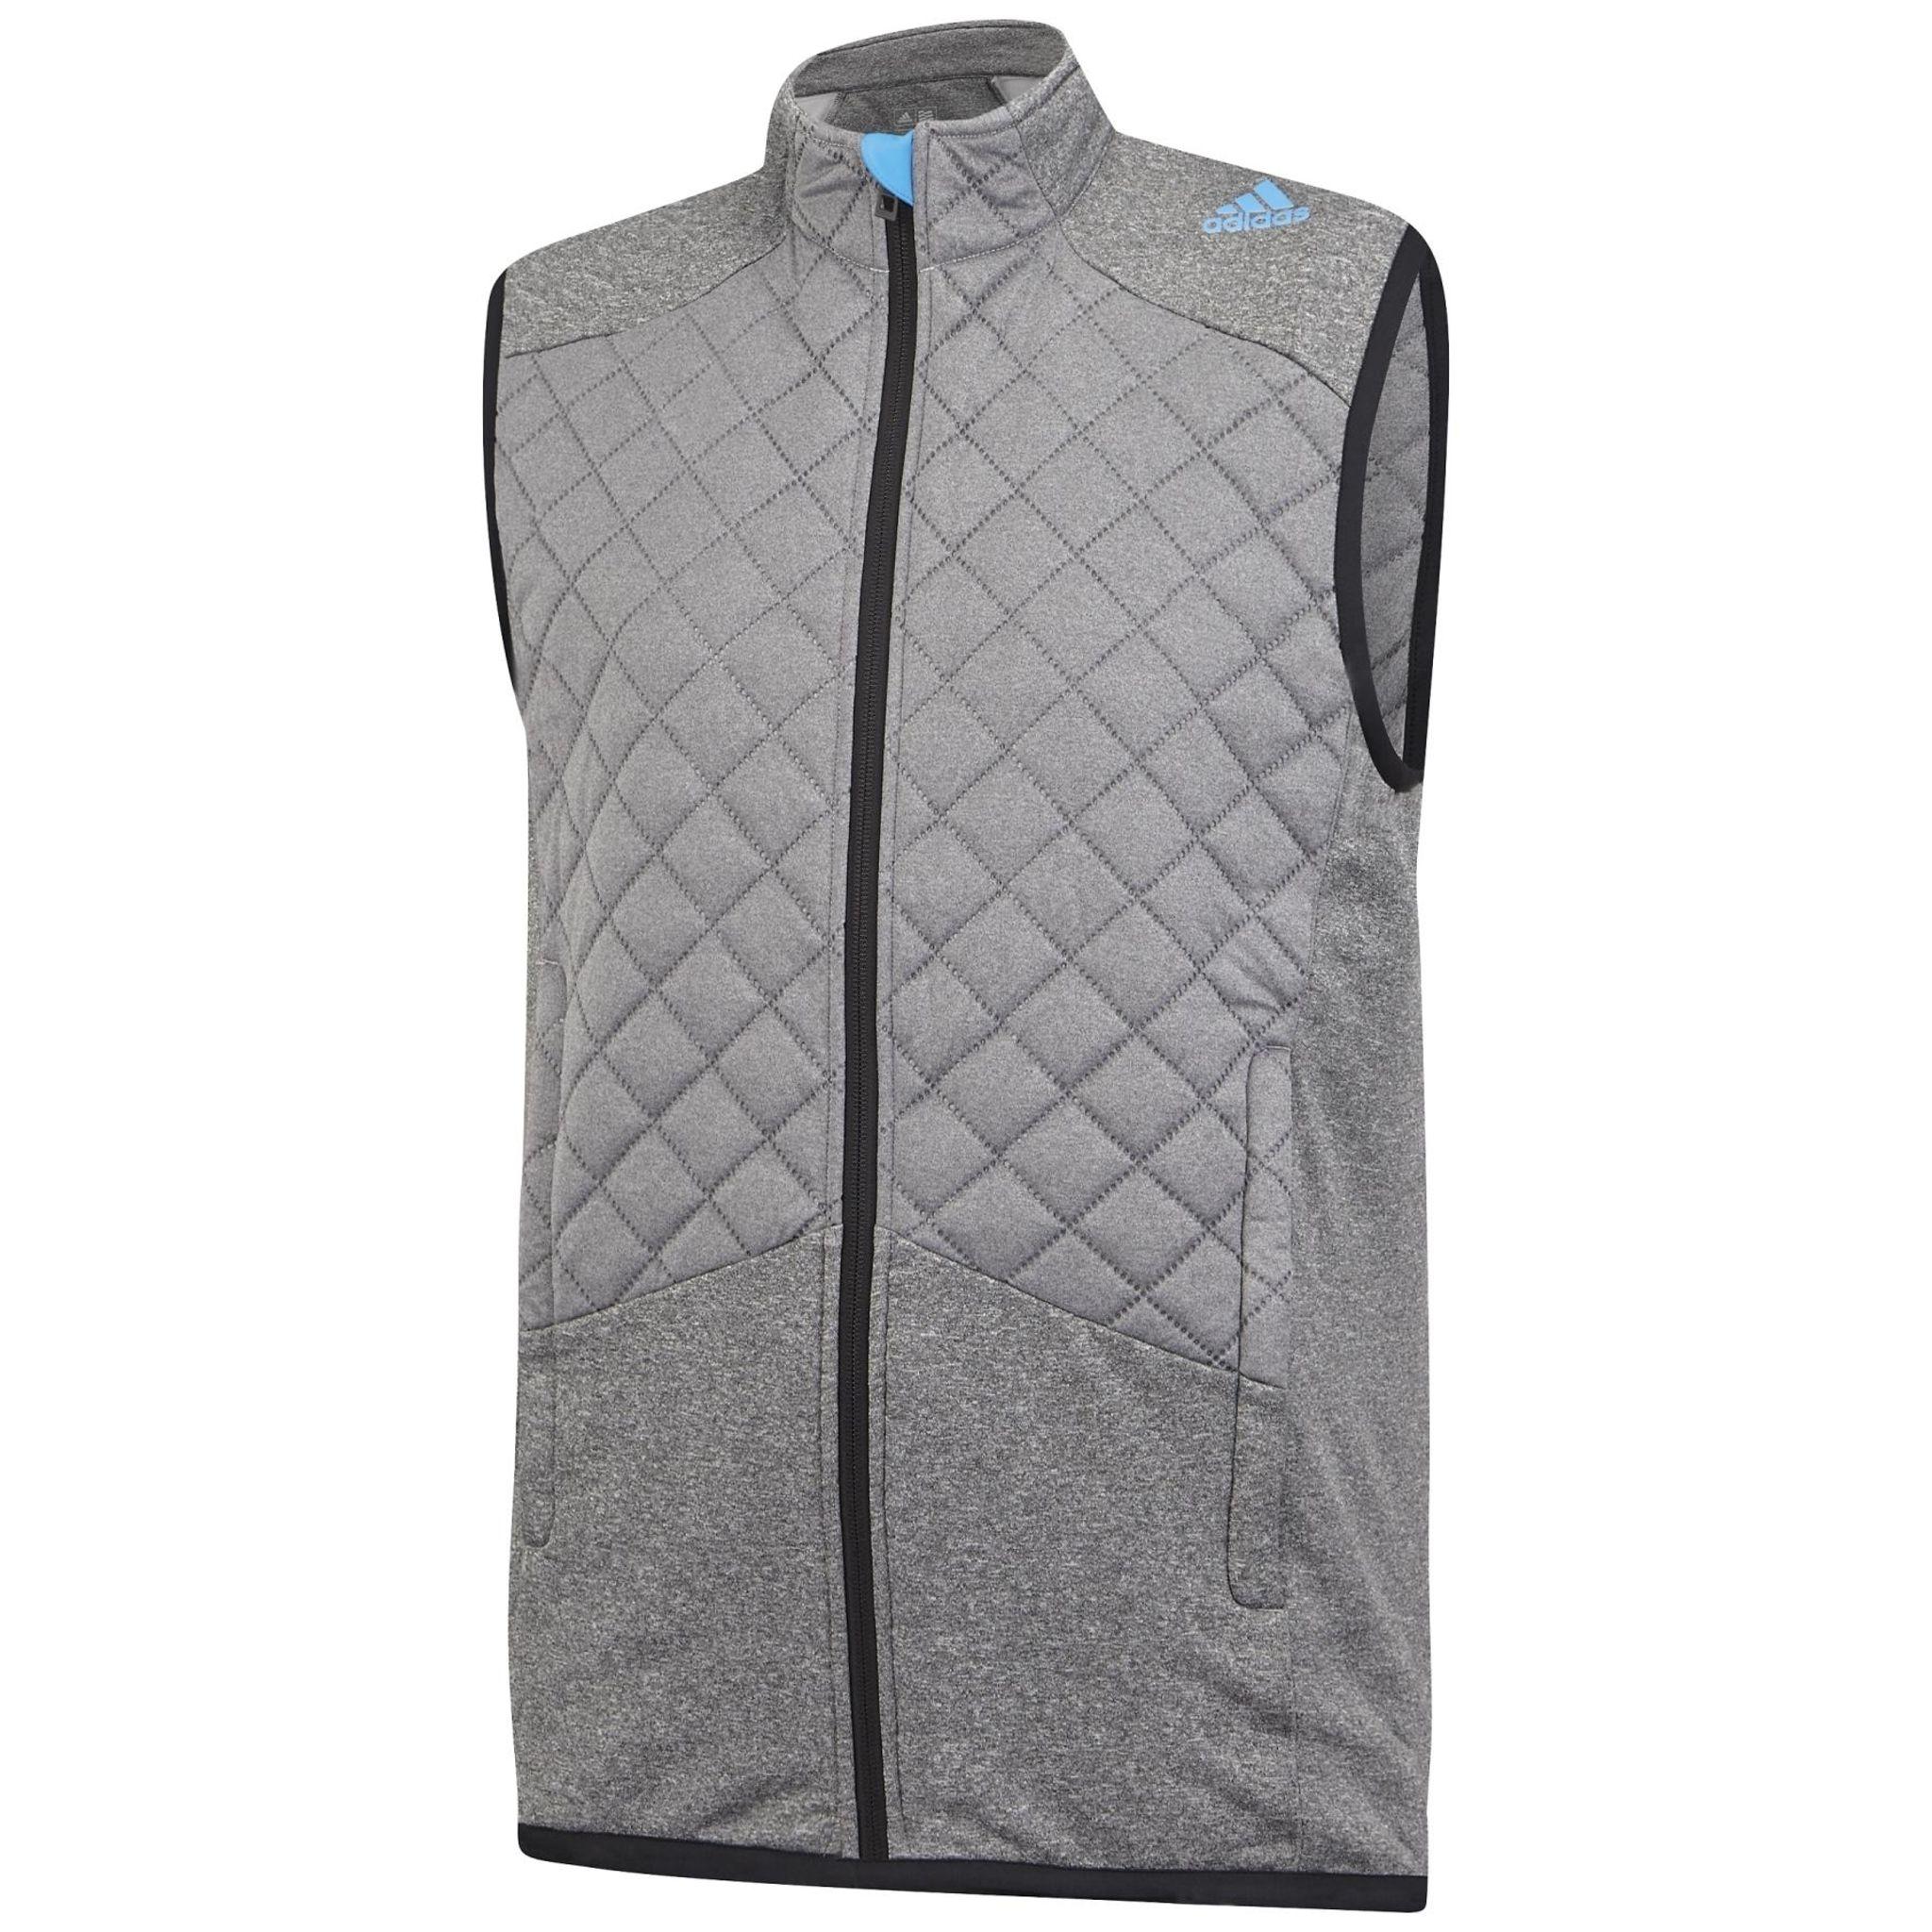 17+ Adidas golf sweater jason day ideas